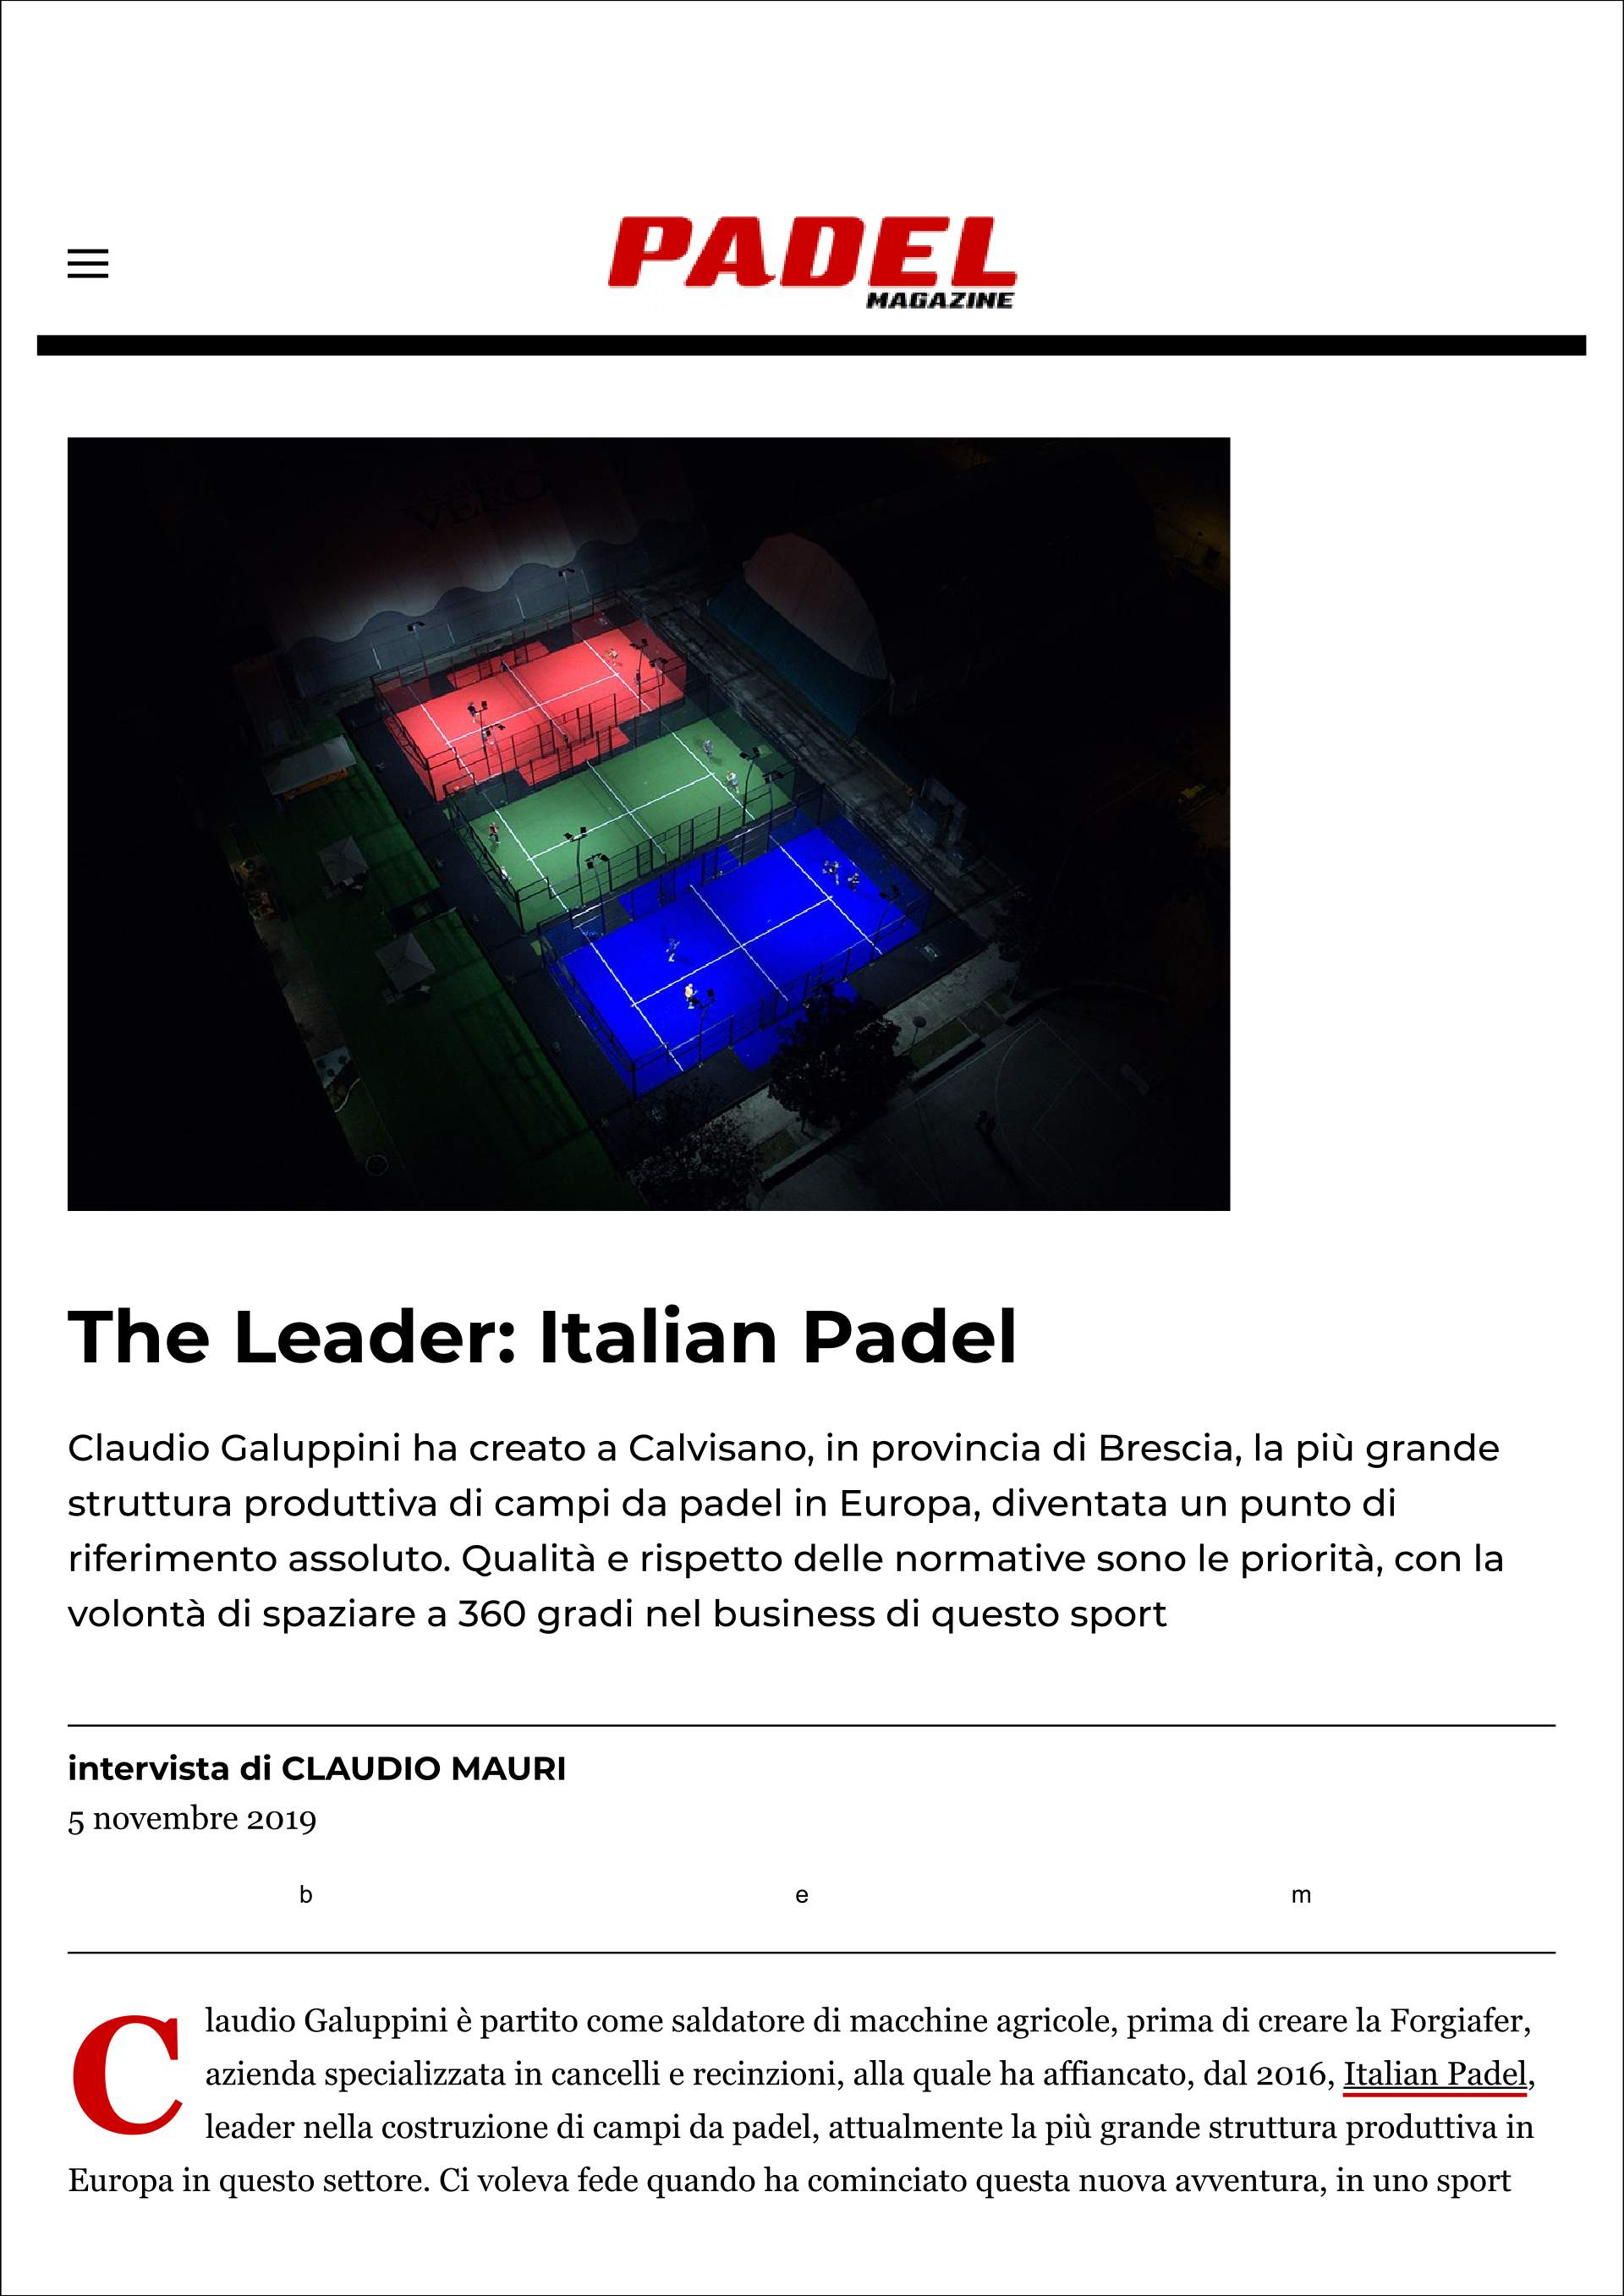 The Leader: Italian Padel (Padel Magazine - 5 novembre 2019) - 1